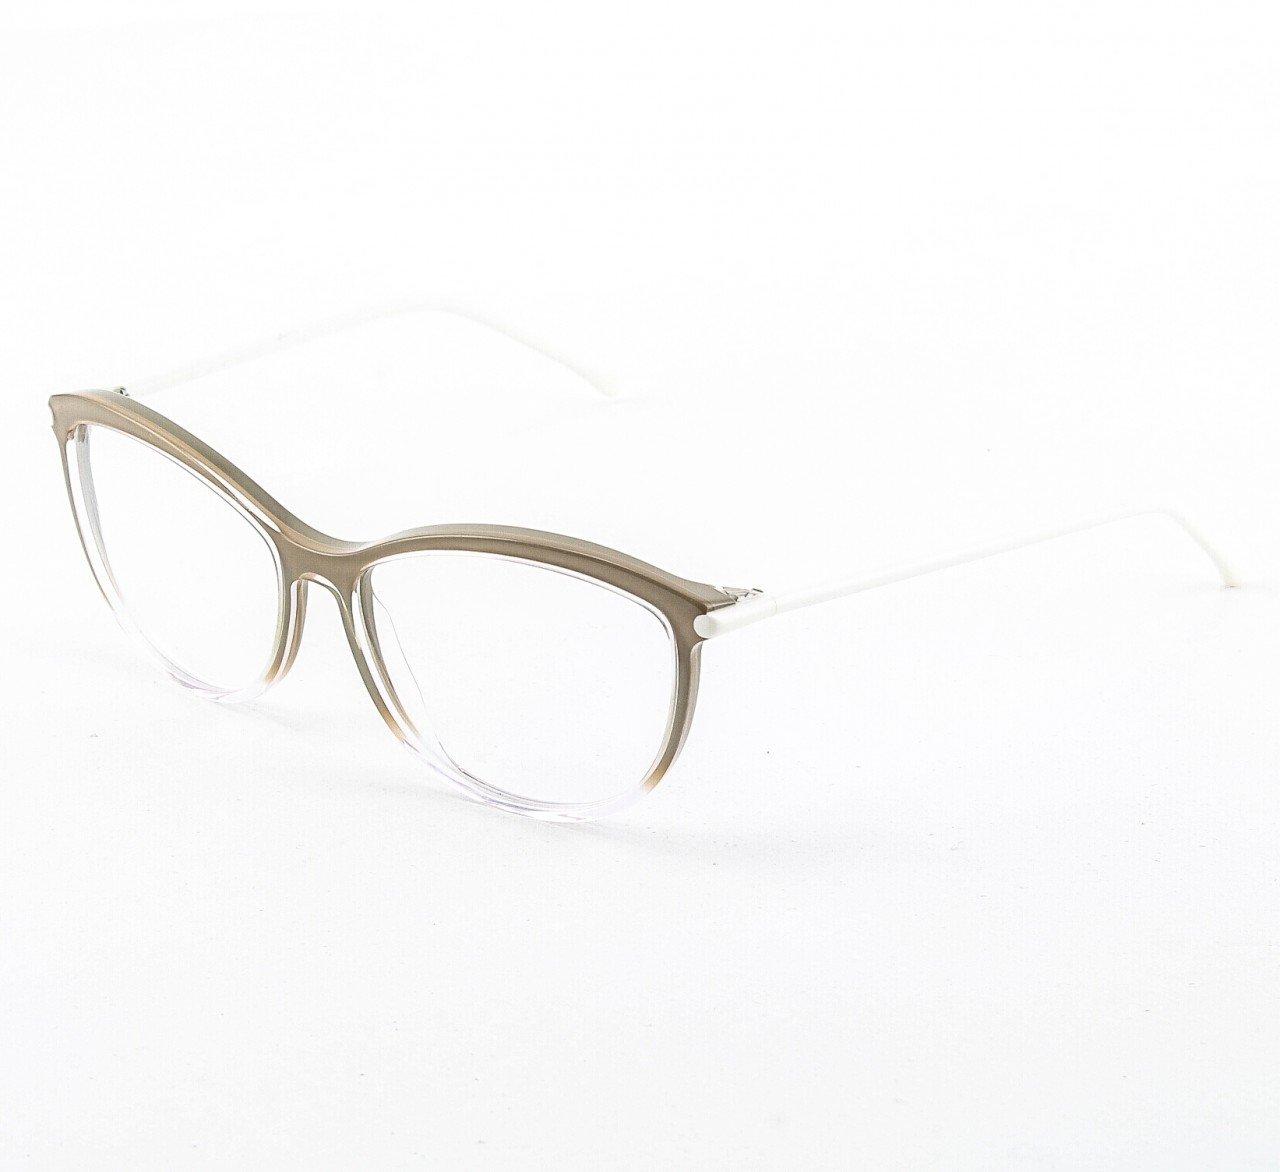 Marni MA677S Eyeglasses 03 Crystal Taupe, White Enamel Accents, Demo Lenses